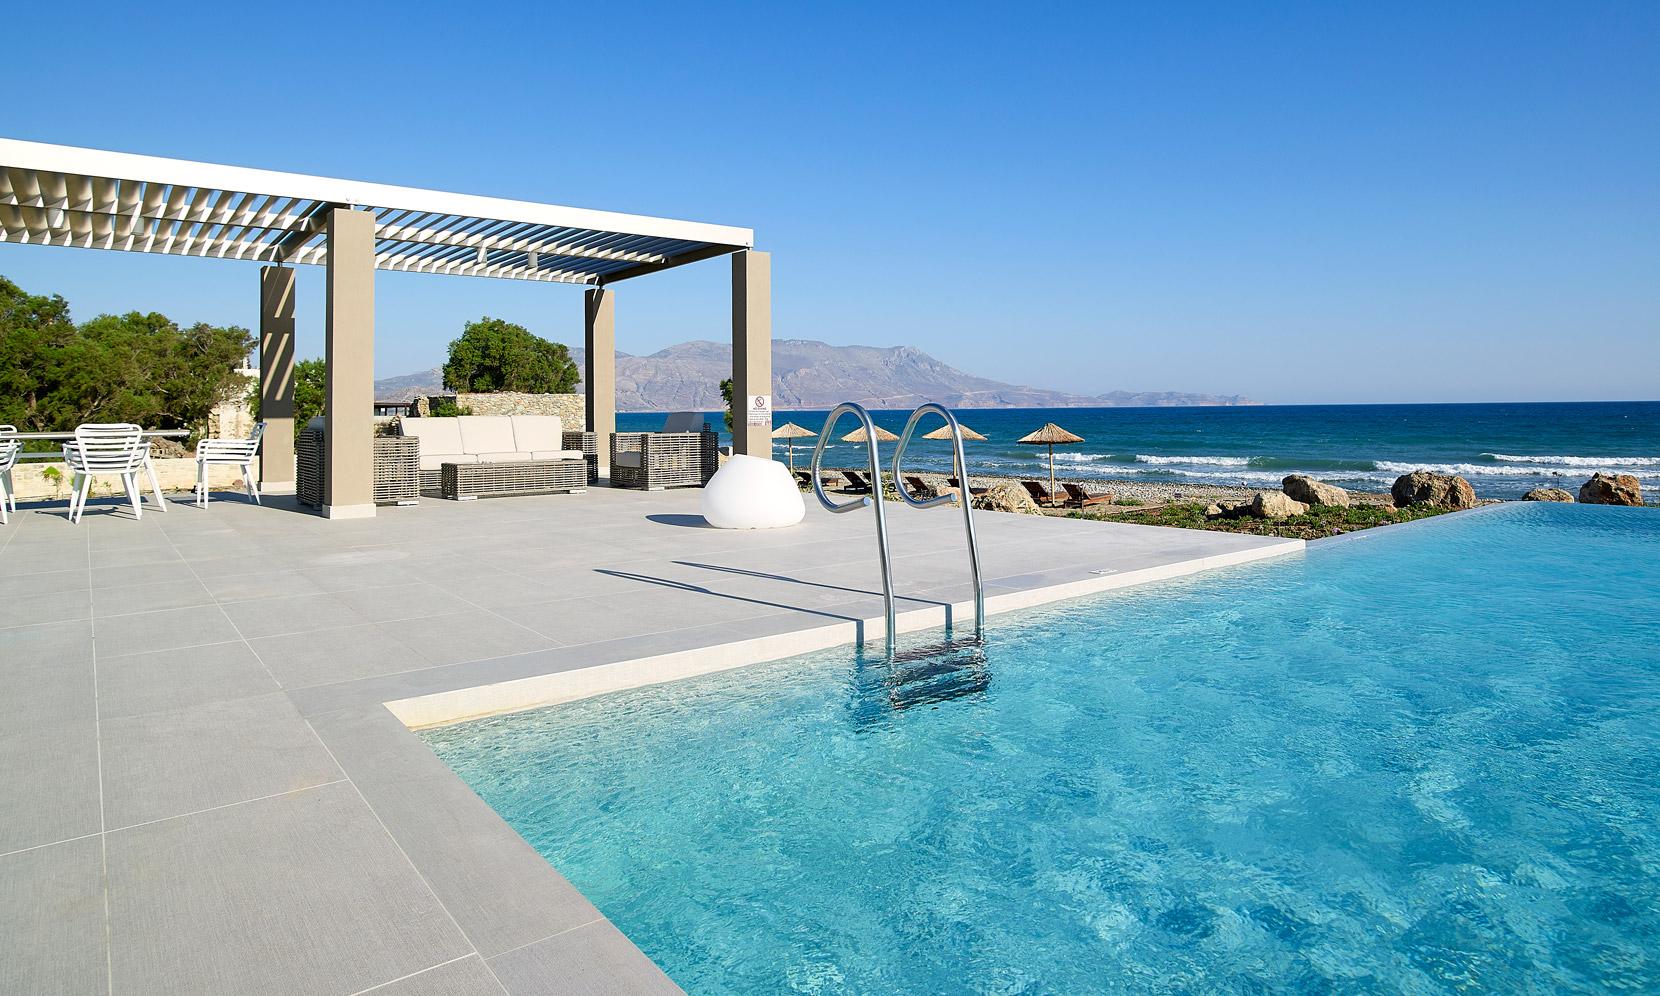 Crete Villa Acerol 1 jumbotron image